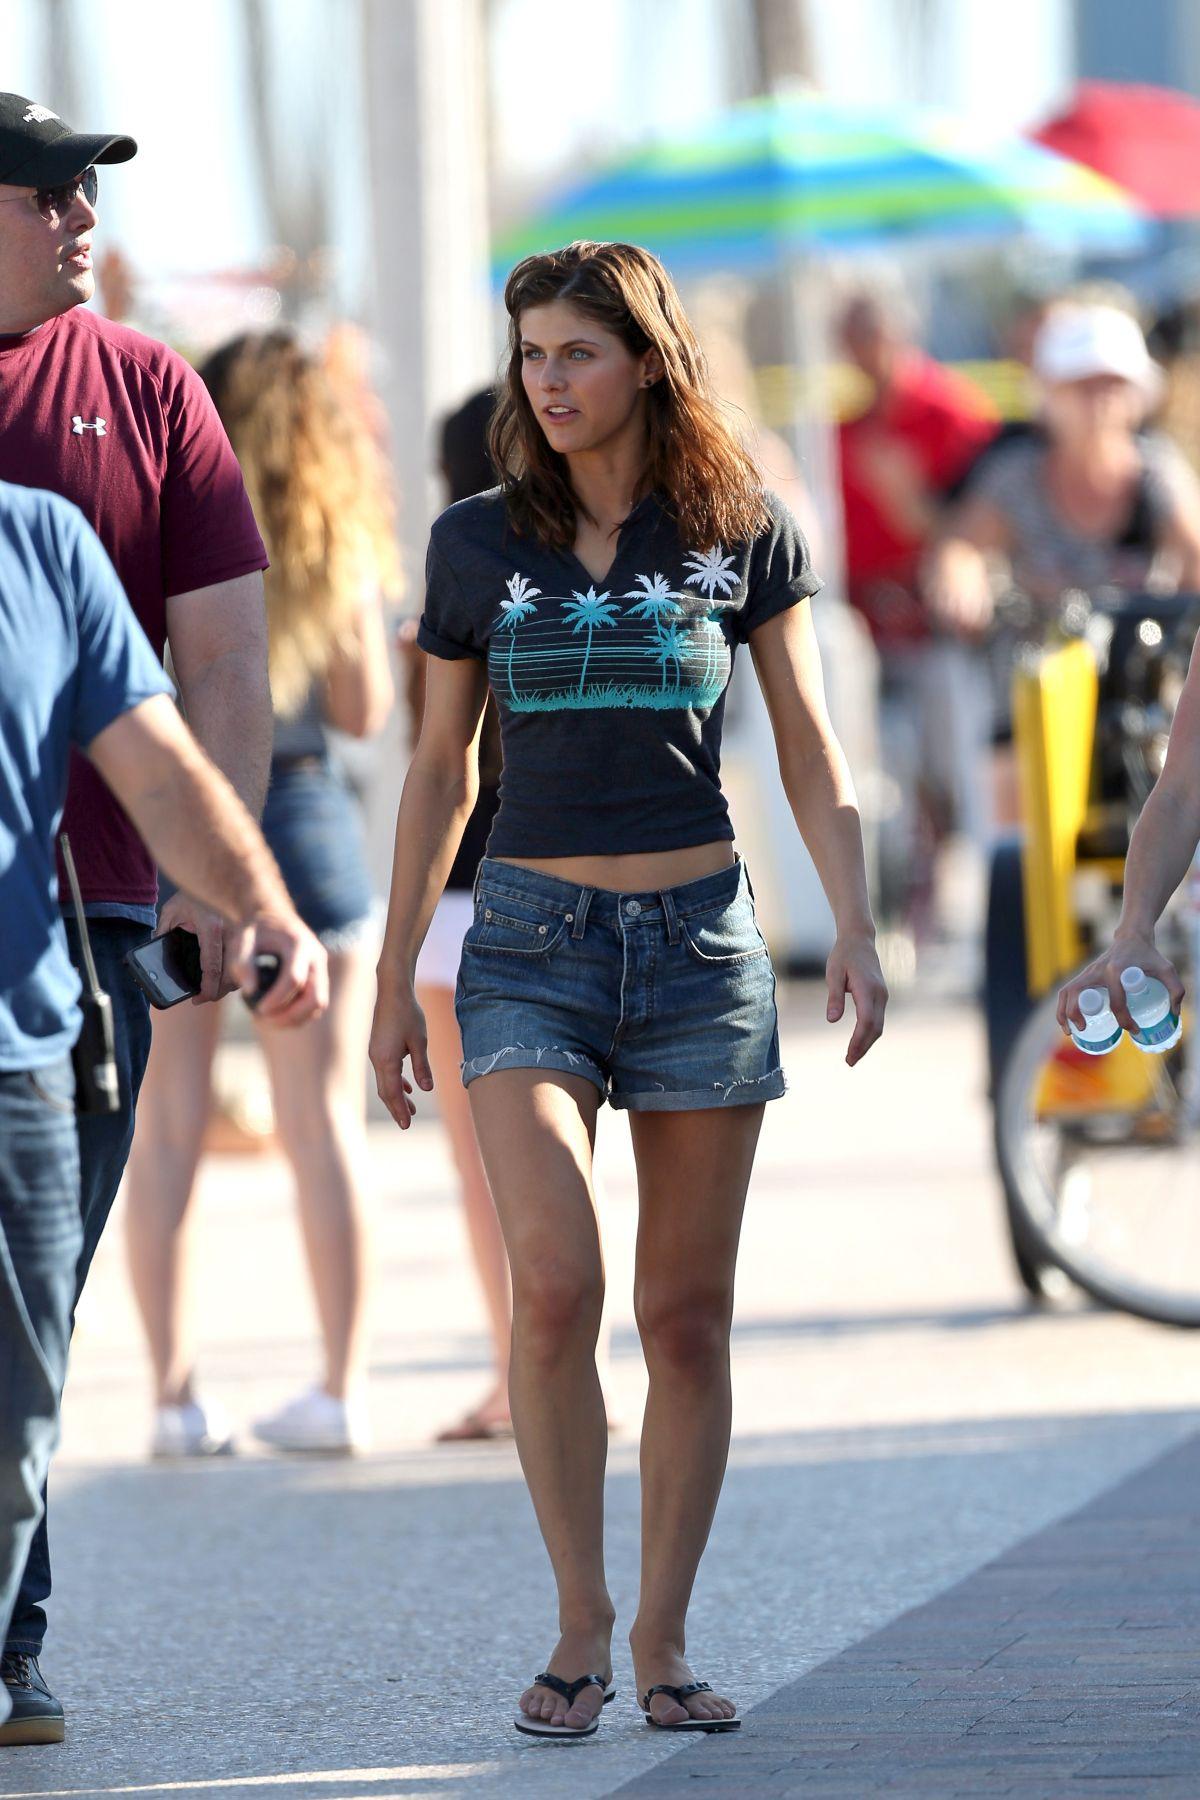 ALEXANDRA DADDARIO in Denim Shorts Out at Deerfield Beach 02/29 ...